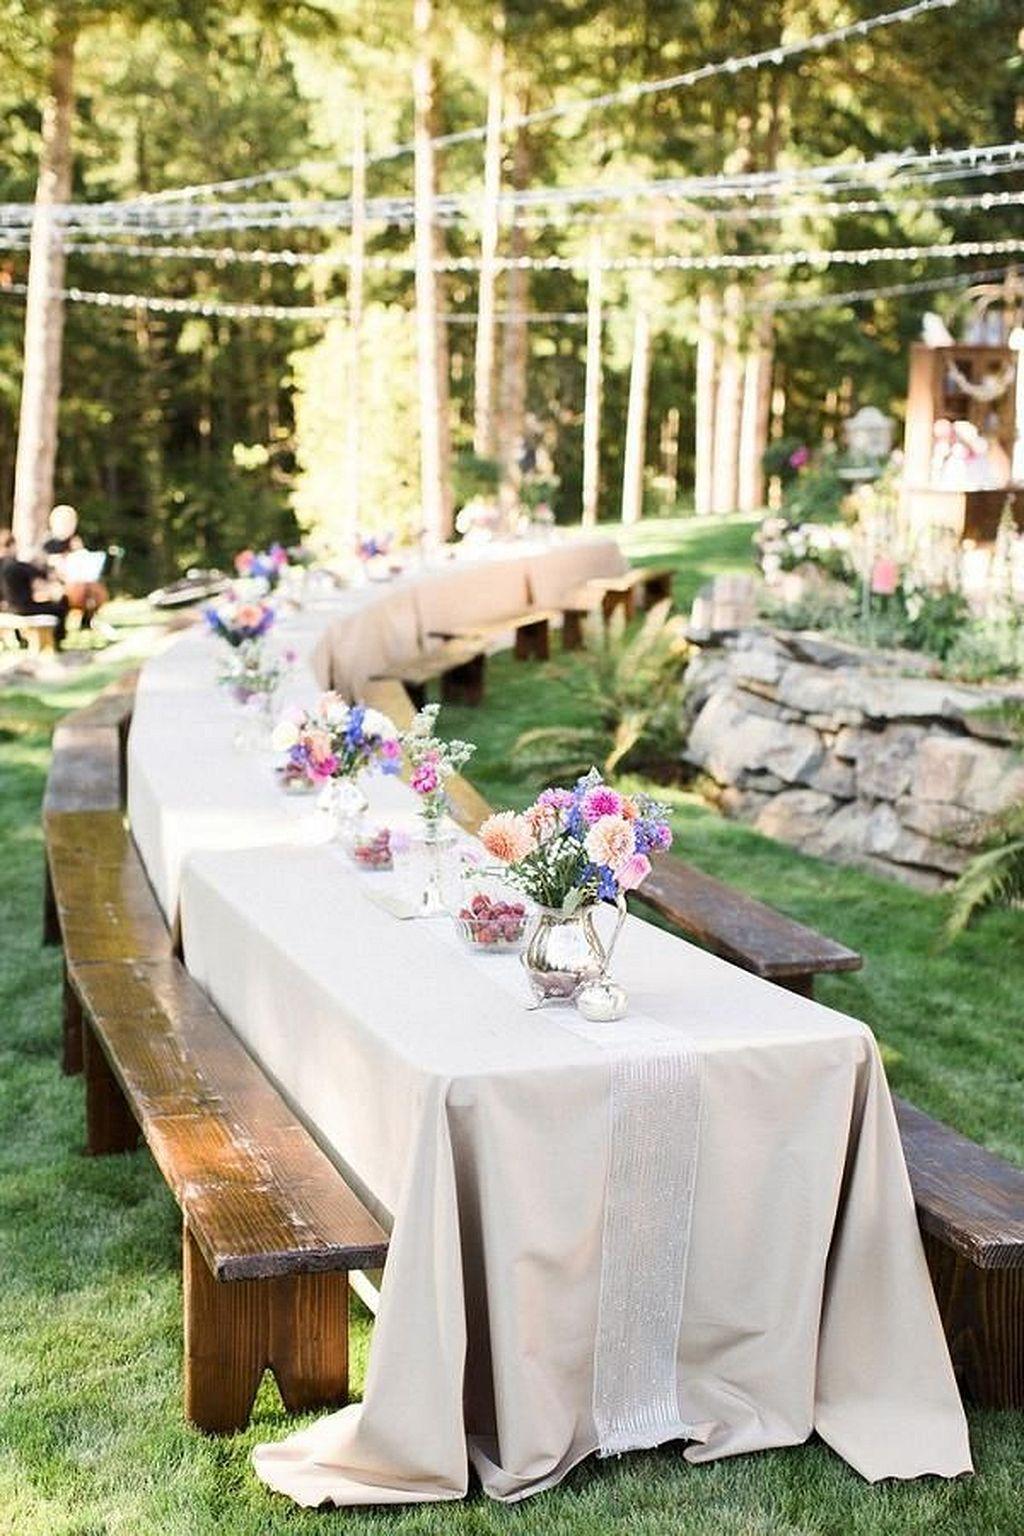 40 Wonderful Backyard Wedding Ideas | Backyard weddings, Weddings ...